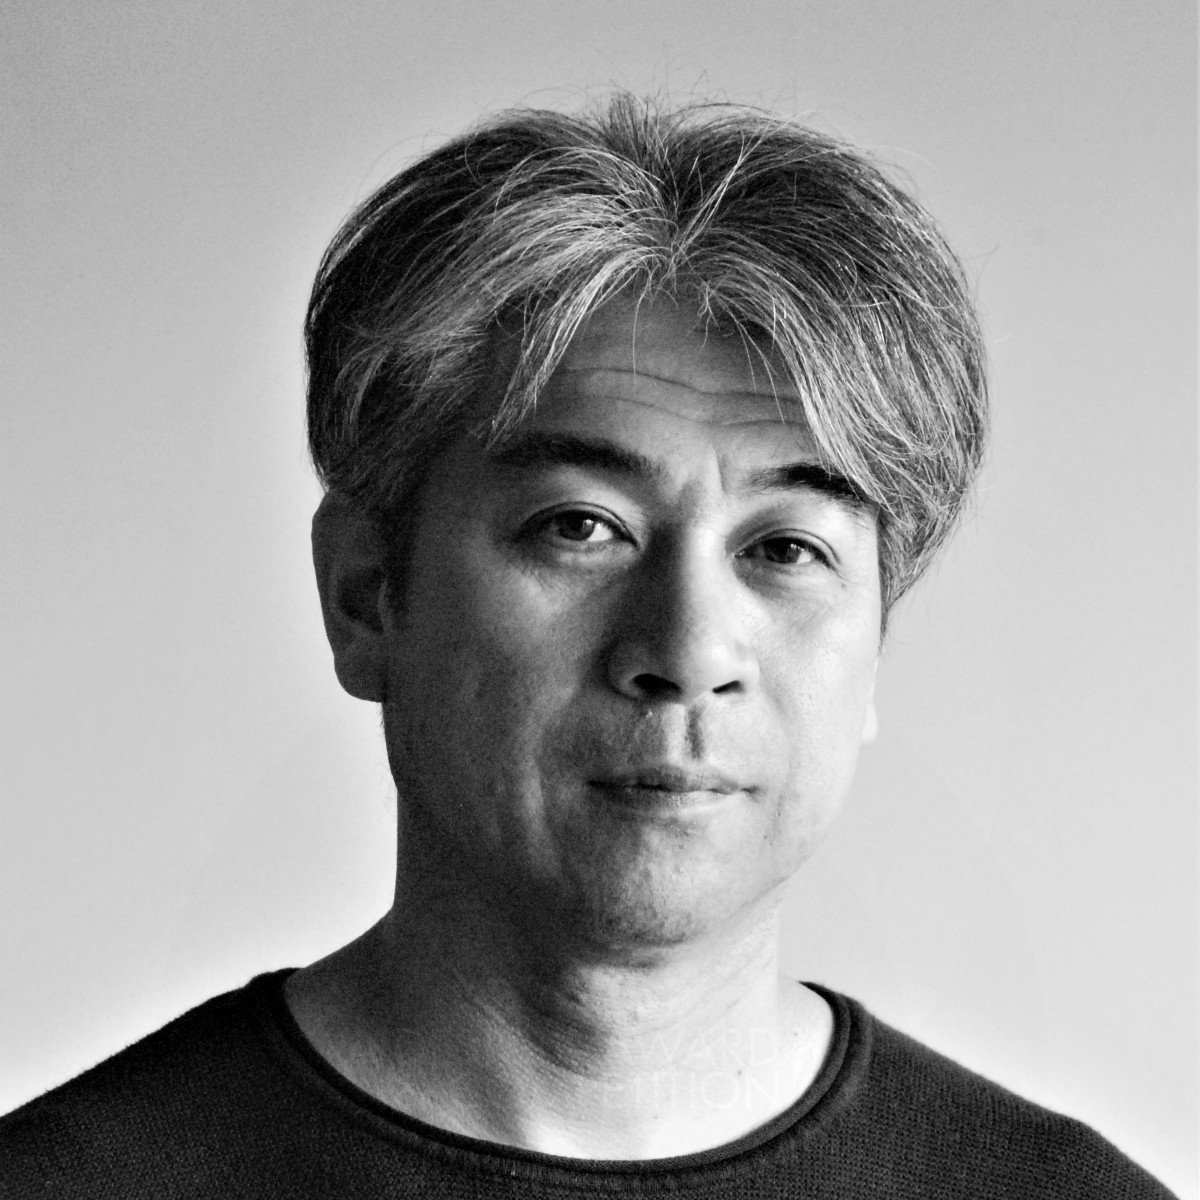 SATORU NAKAHARA